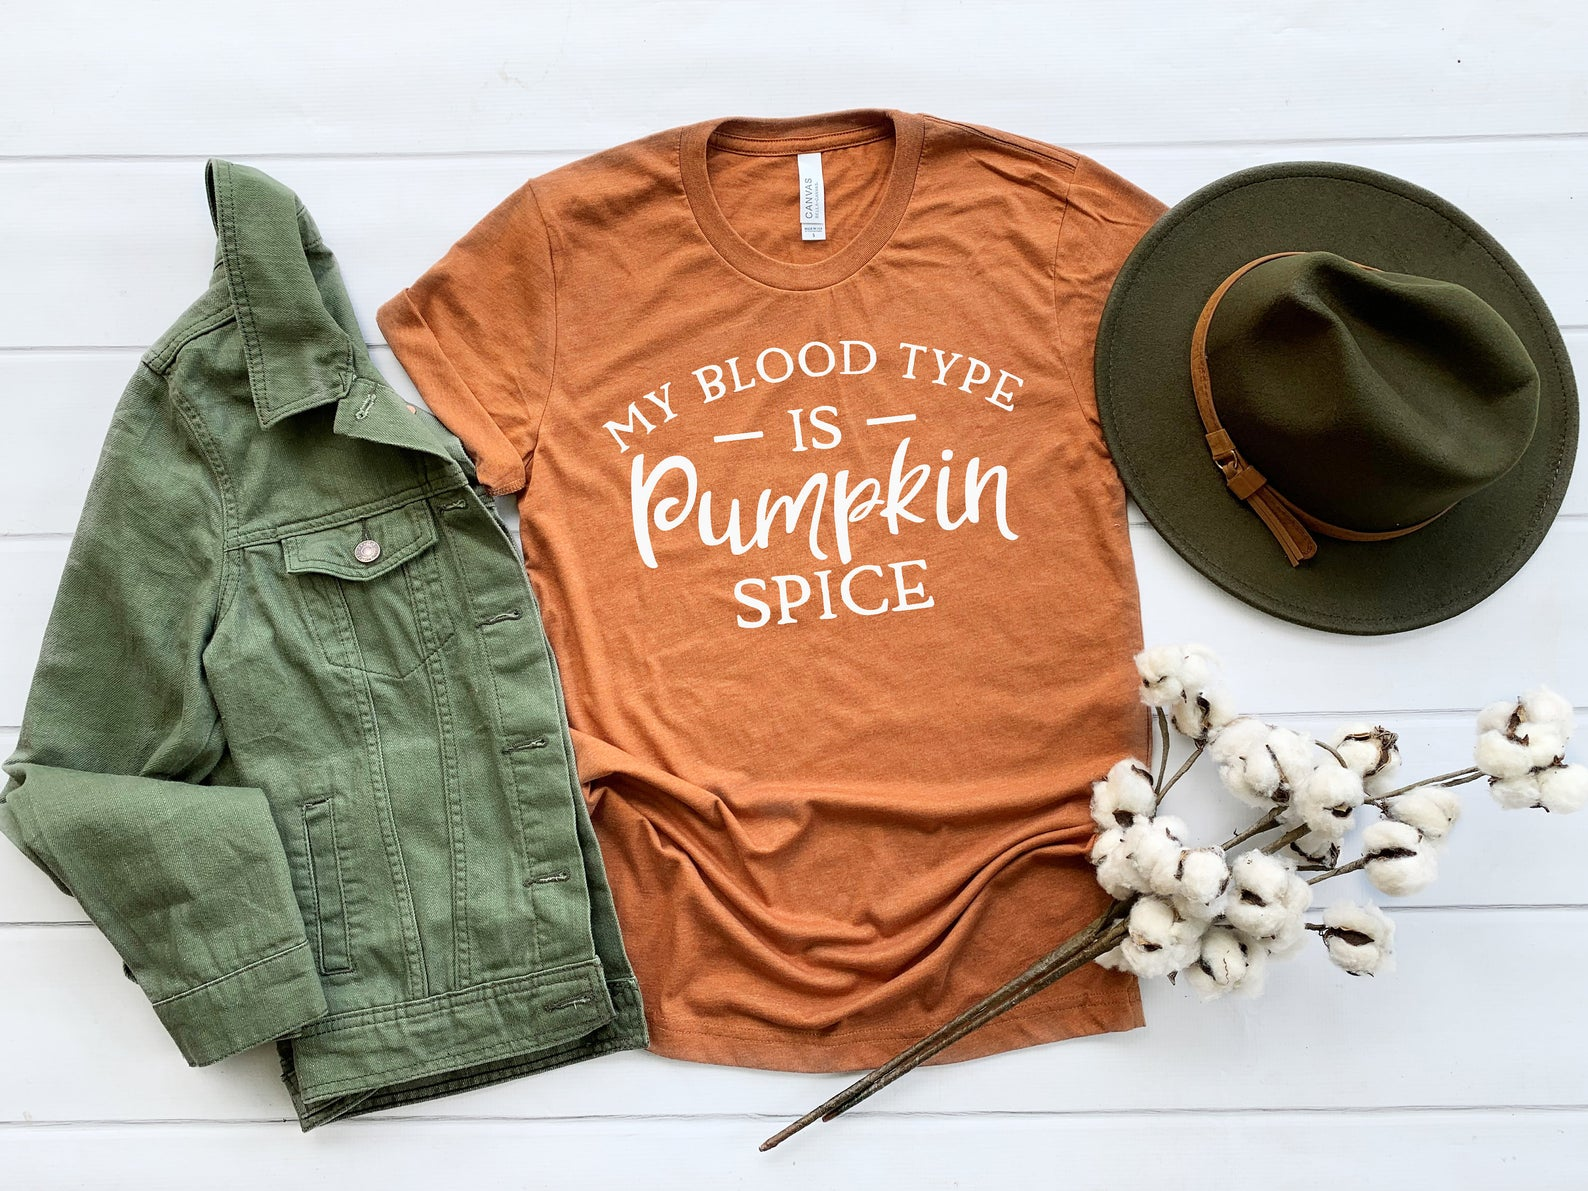 pumpkin spice shirt - my blood type is pumpkin spice